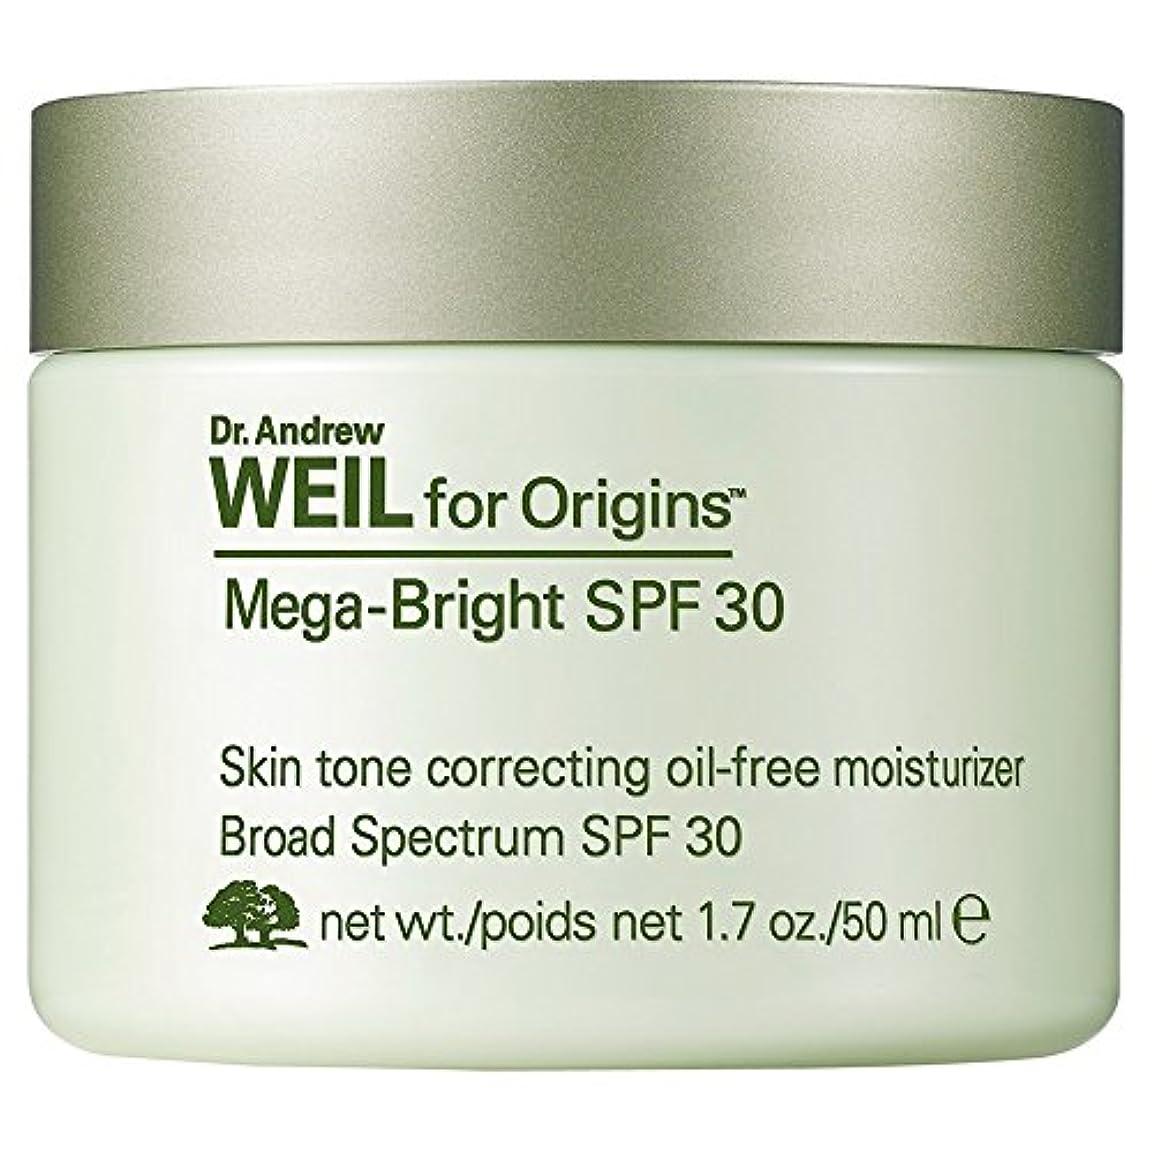 Dr。保湿、50ミリリットルの補正アンドルー?ワイルメガブライトSpf30の肌のトーン (Origins) (x6) - Dr. Andrew Weil Mega-Bright SPF30 Skin Tone Correcting...